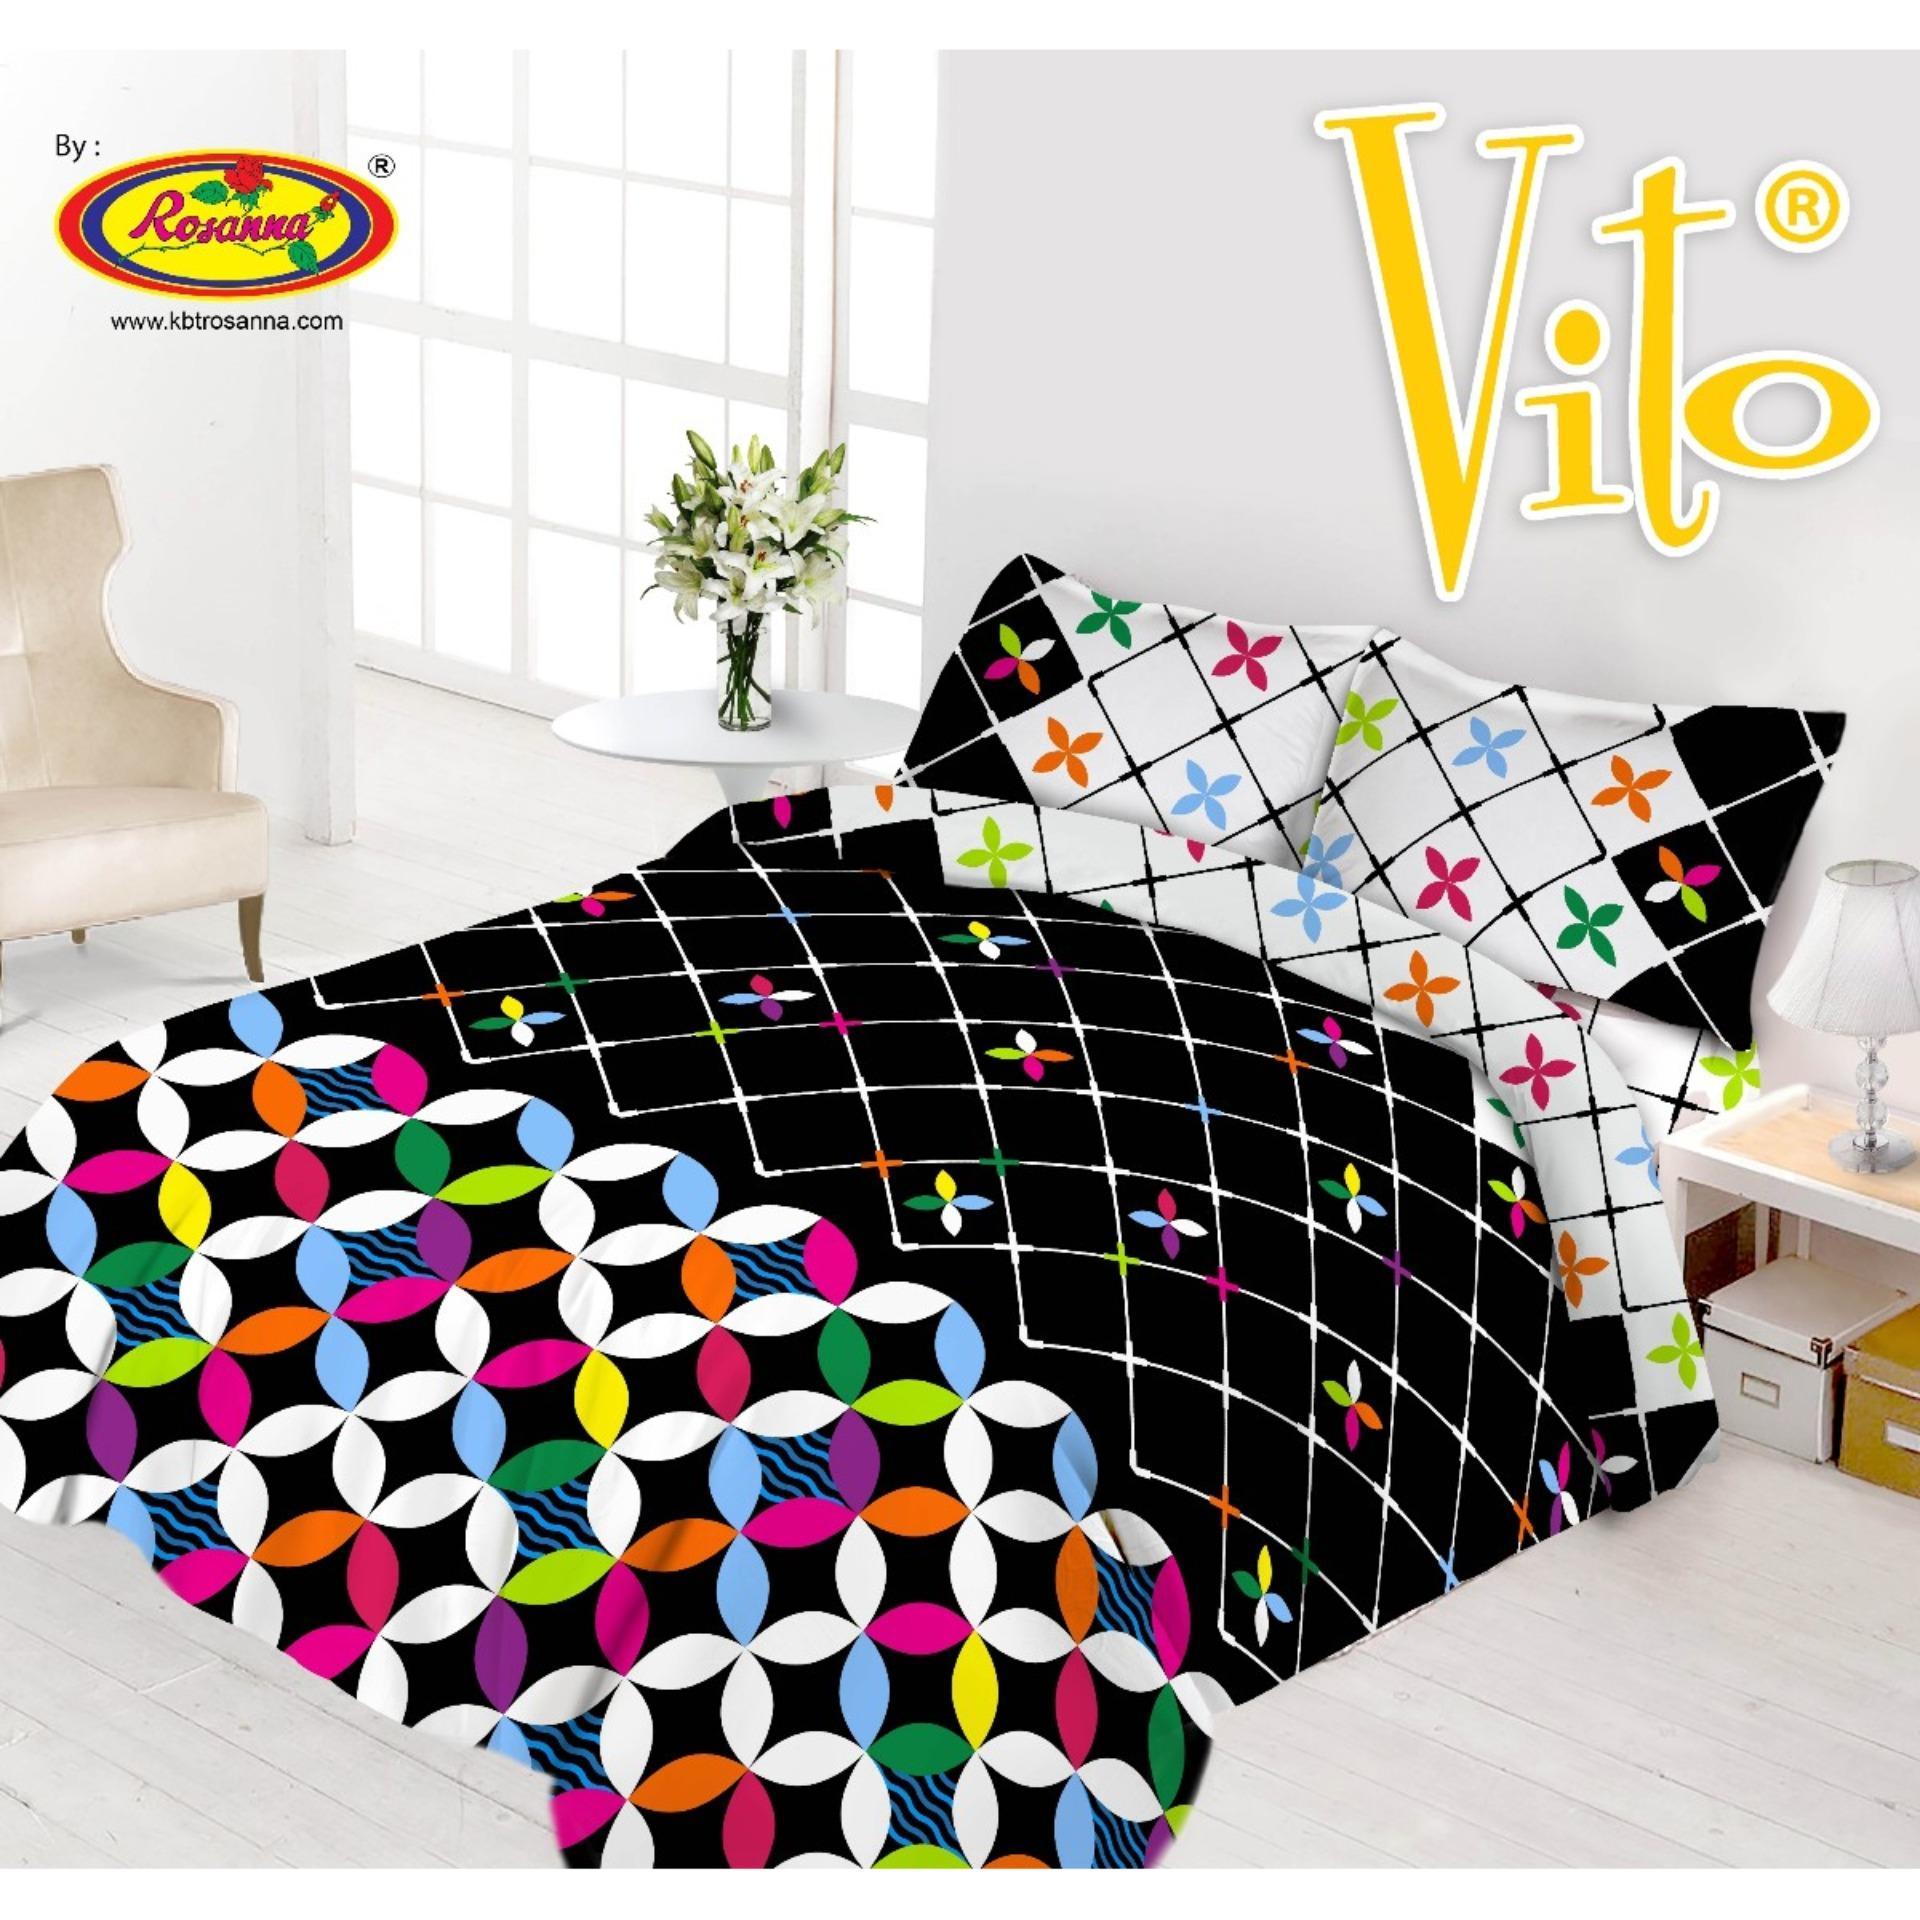 Home Living Vito Sprei Daftar Harga Maxtron Mg 361 Ello Handphone 3d Disperse 180x200 4 Sarung Bantal Black Clover